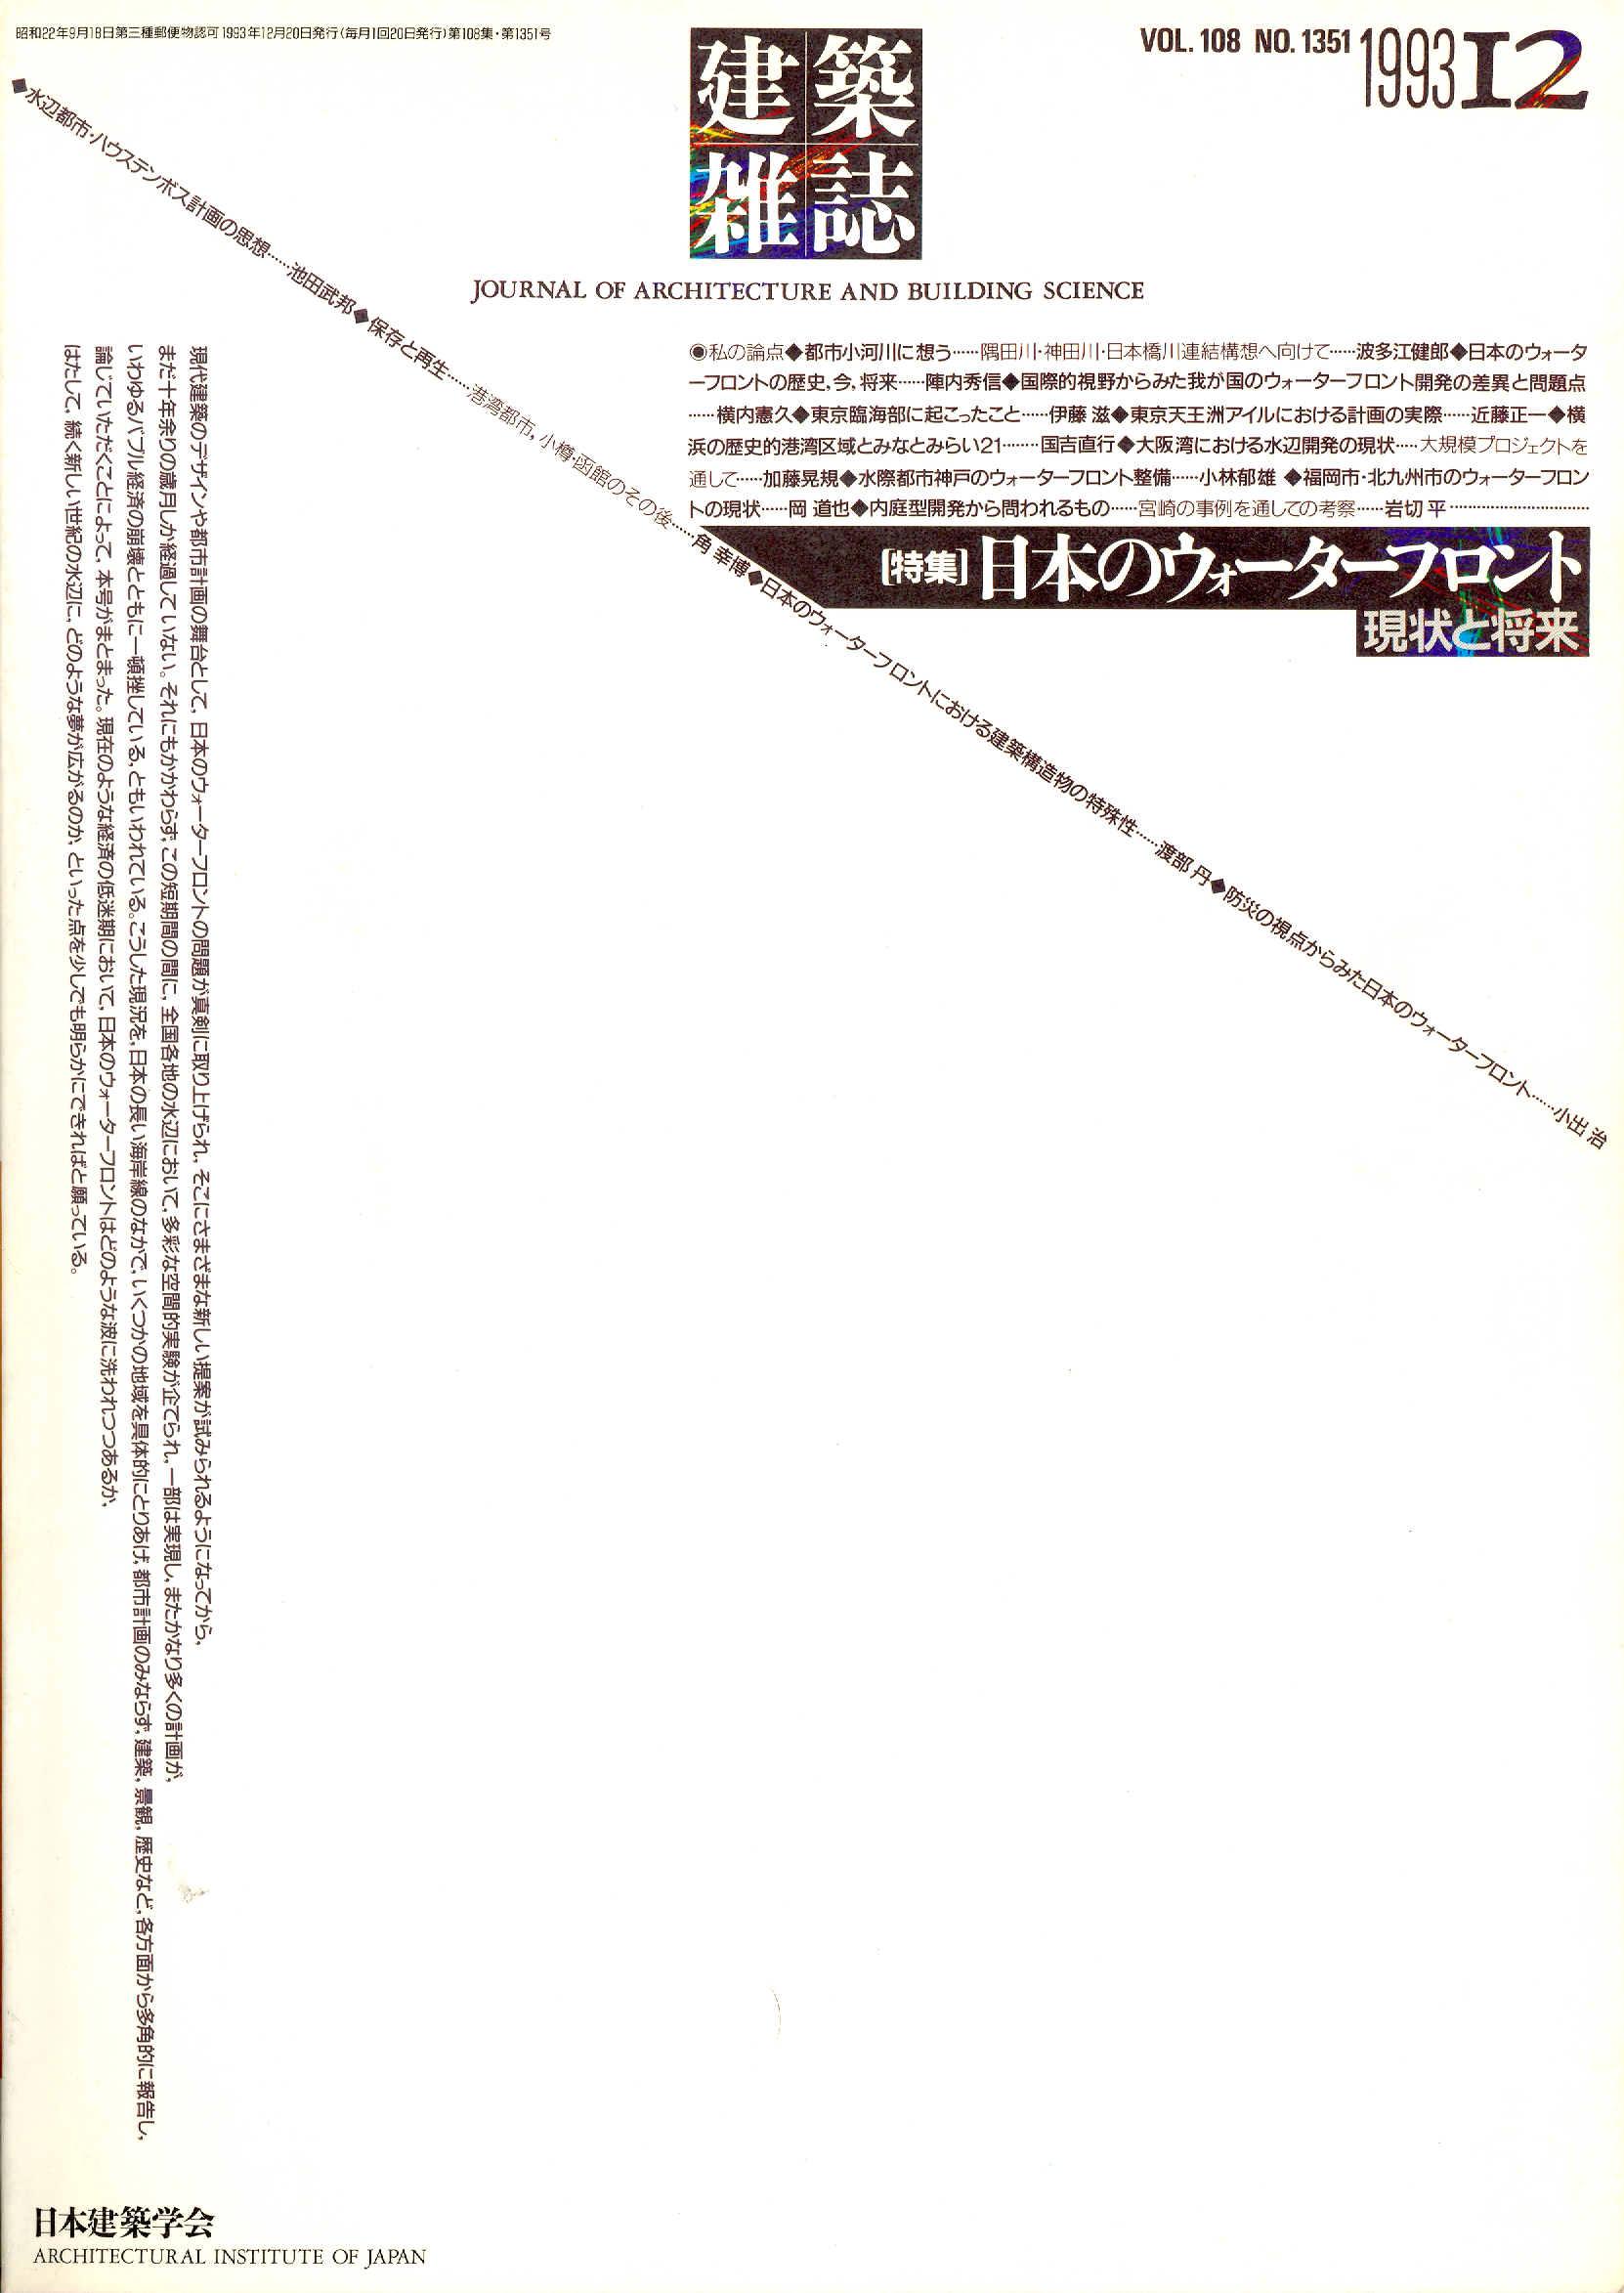 Sp_Arch_Educ0001_Page_1.jpg